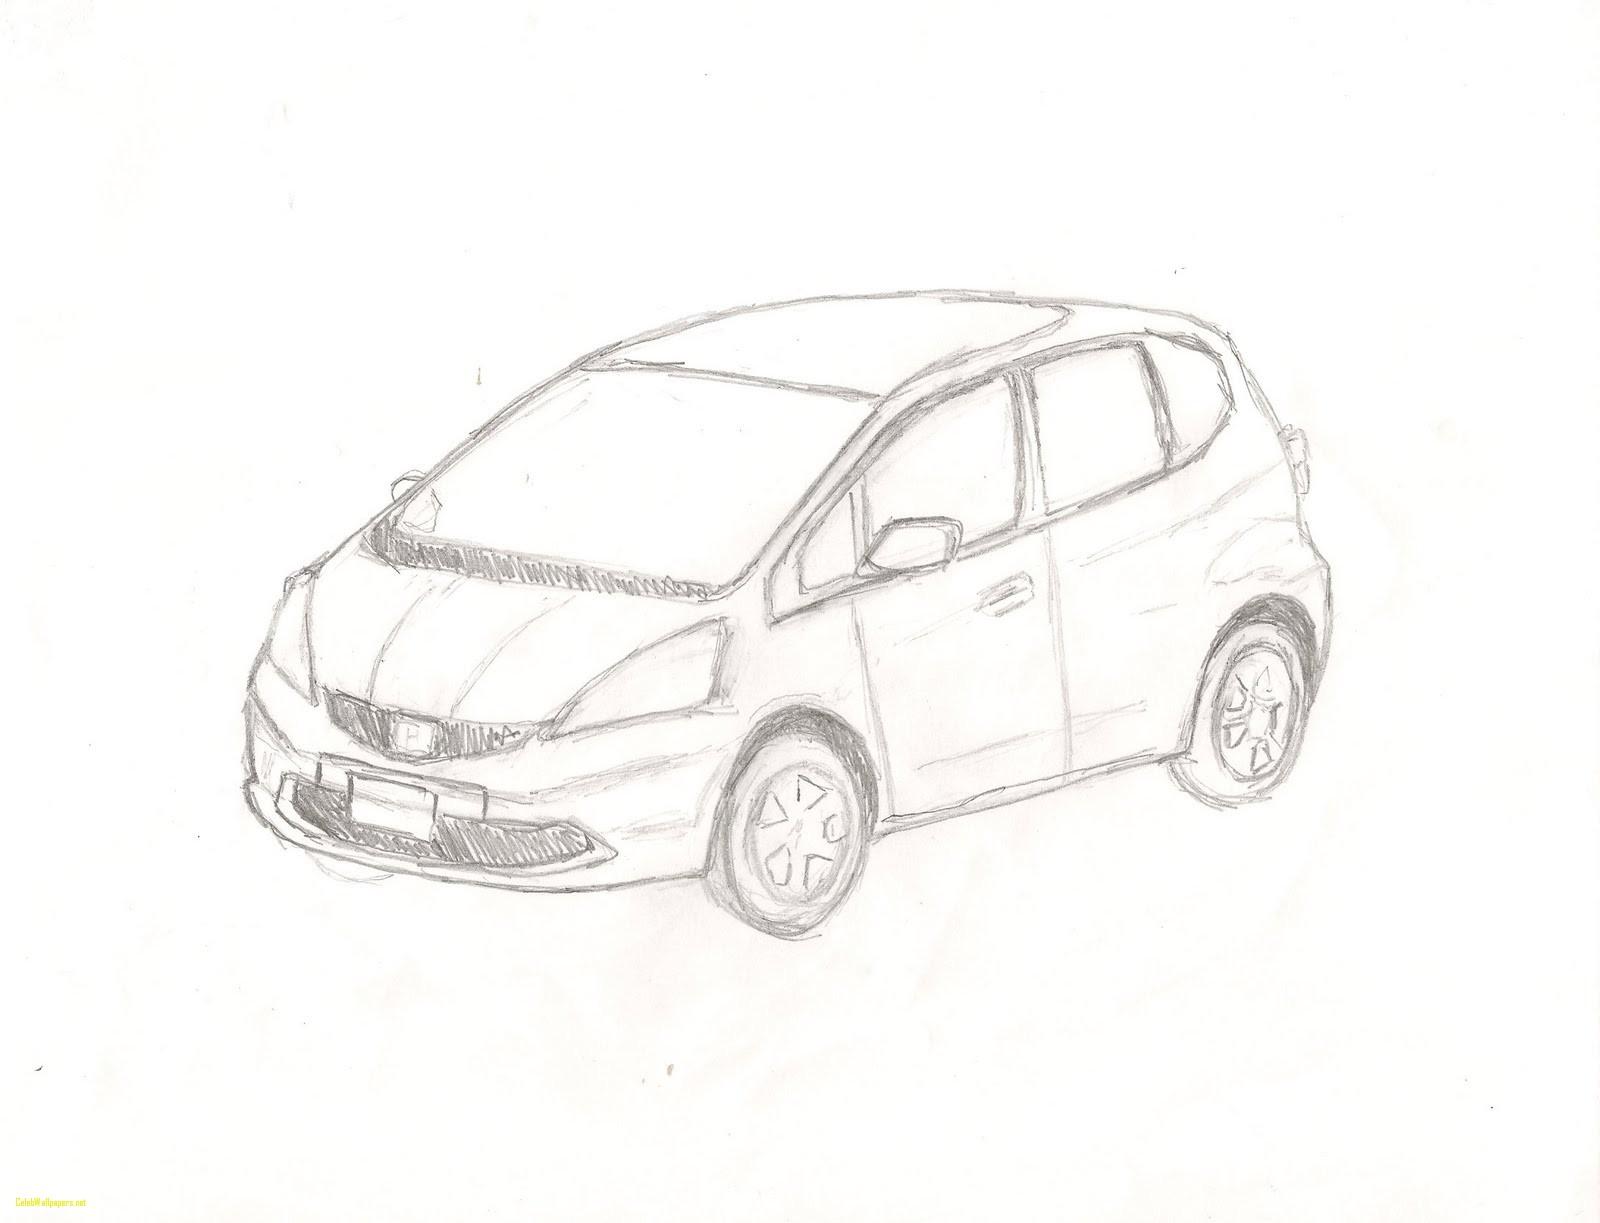 1600x1223 Car Drawings In Pencil Best Of Toyota Supra Tuning Car Drawing